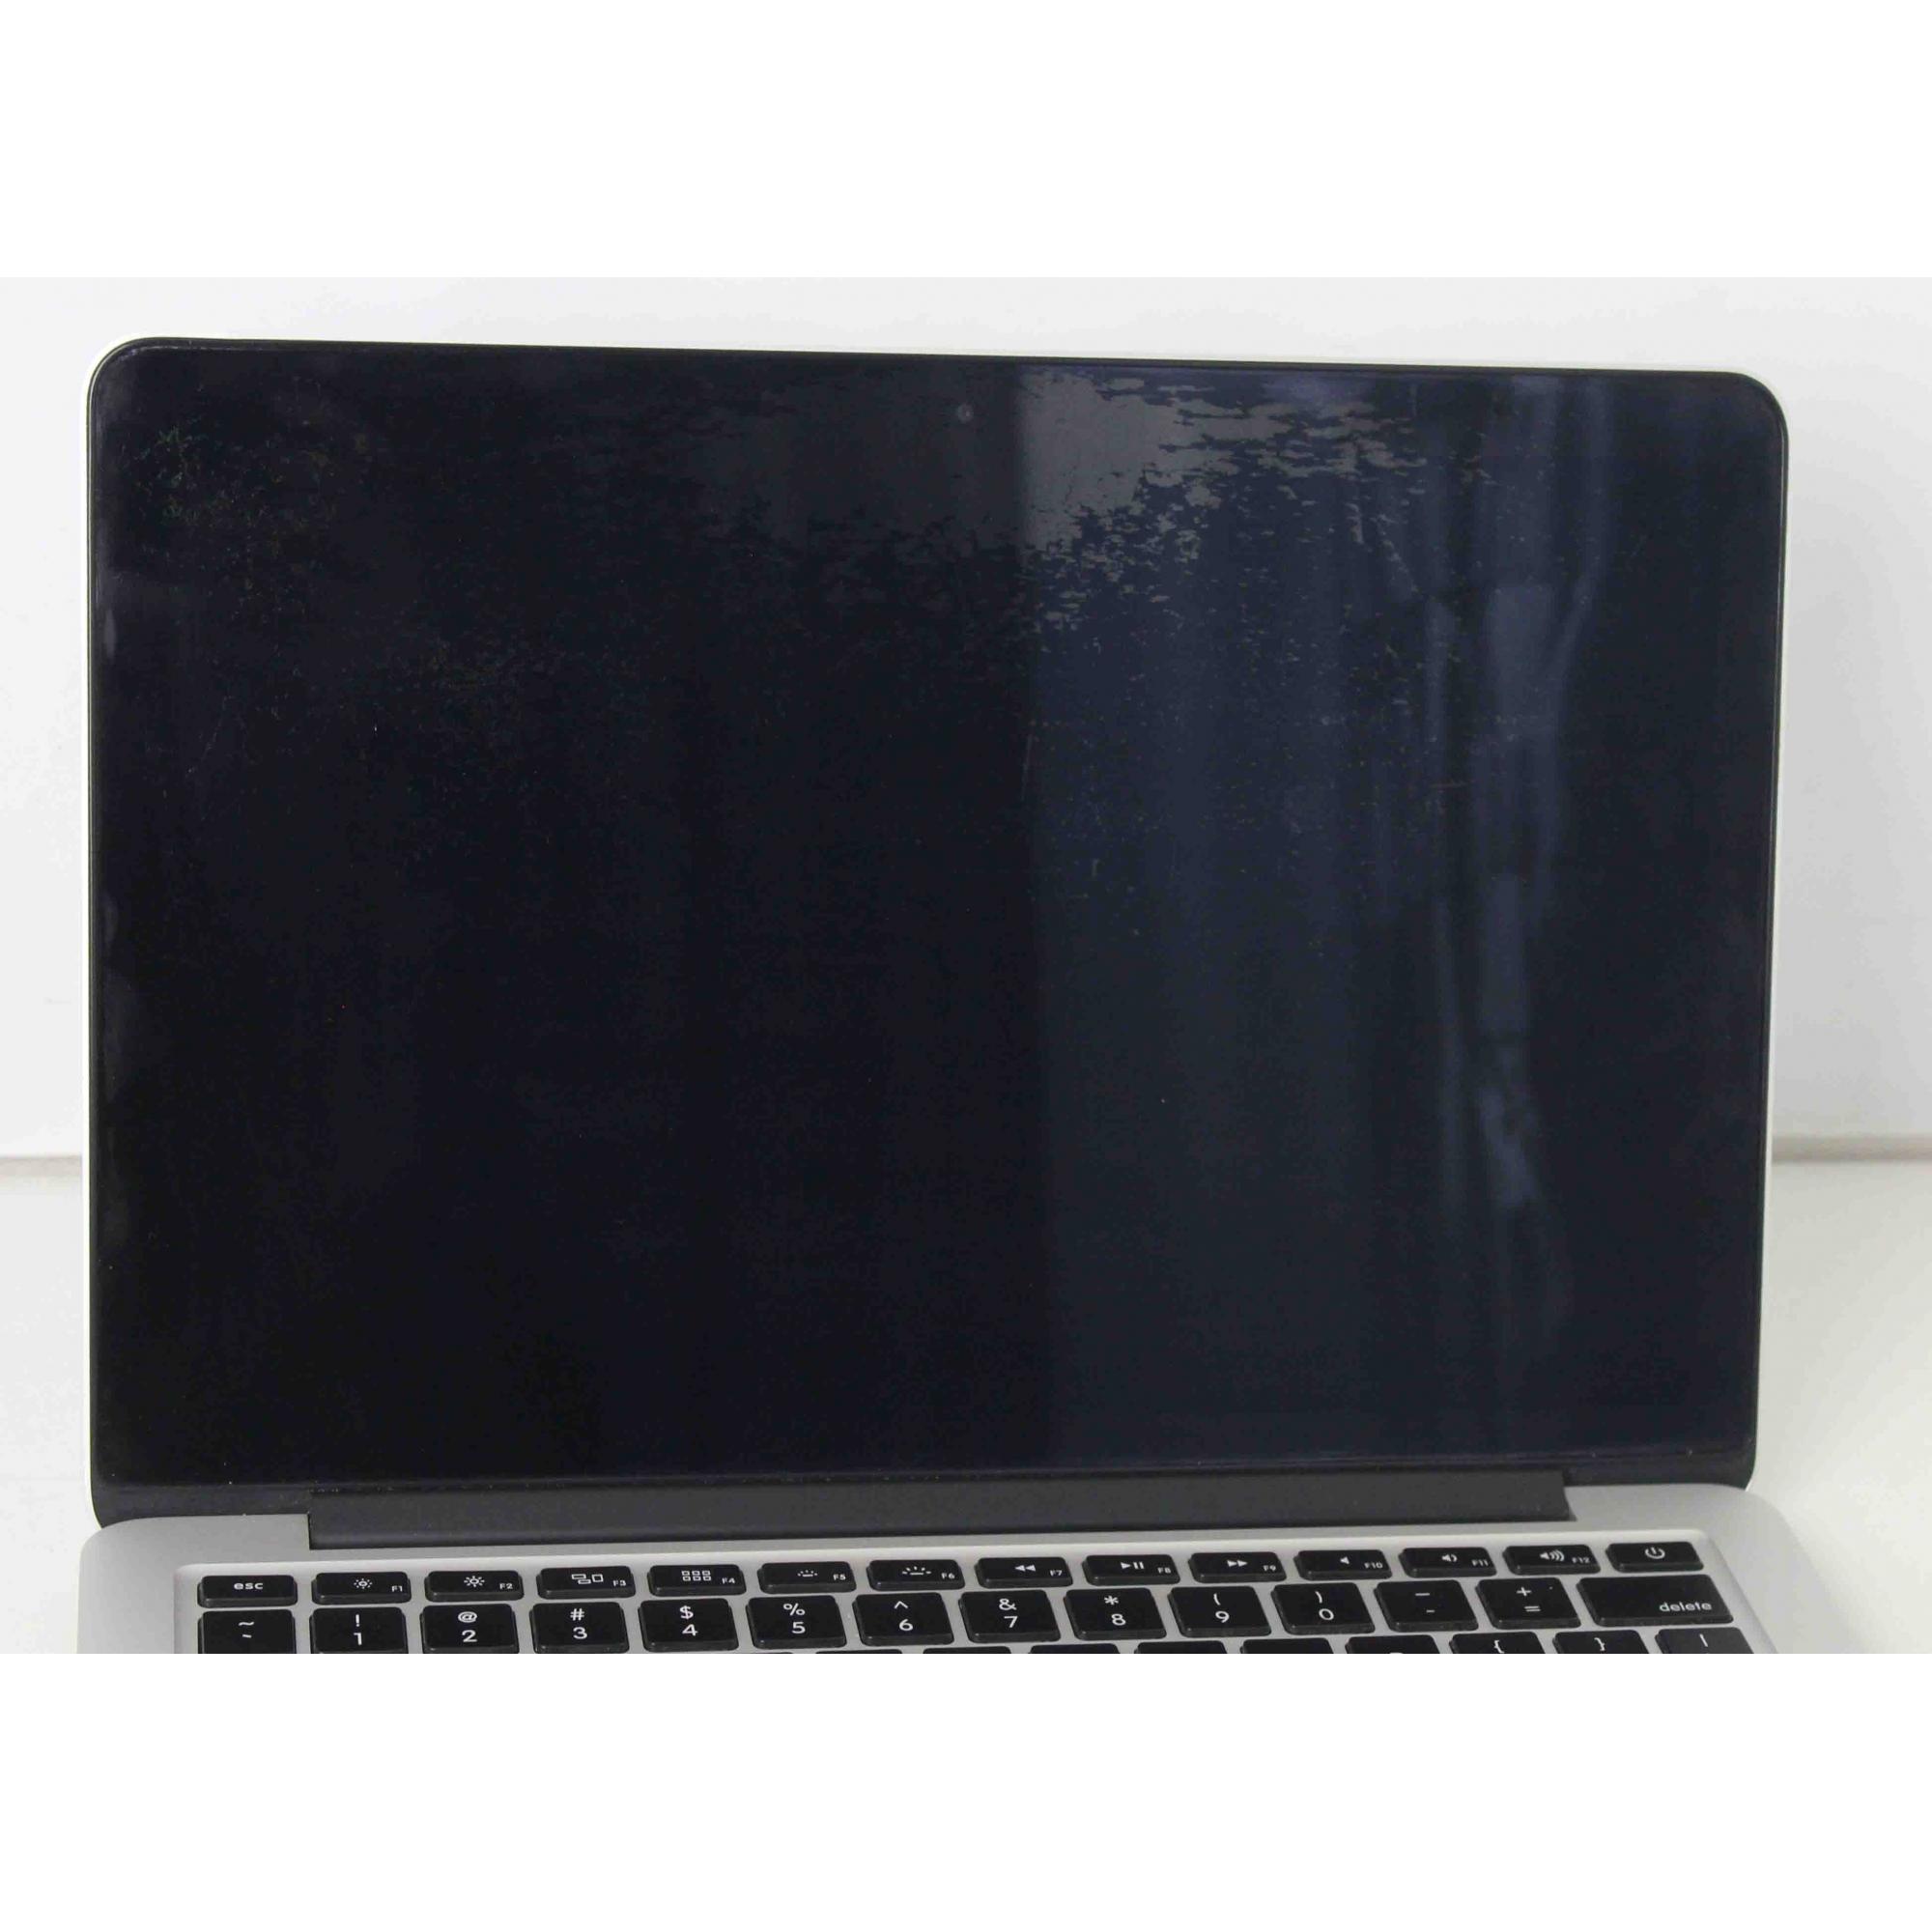 "Macbook Pro ME864LL/A 13.3"" Intel Core i5 2.4GHz 4GB SSD-128GB (Não Enviamos)"